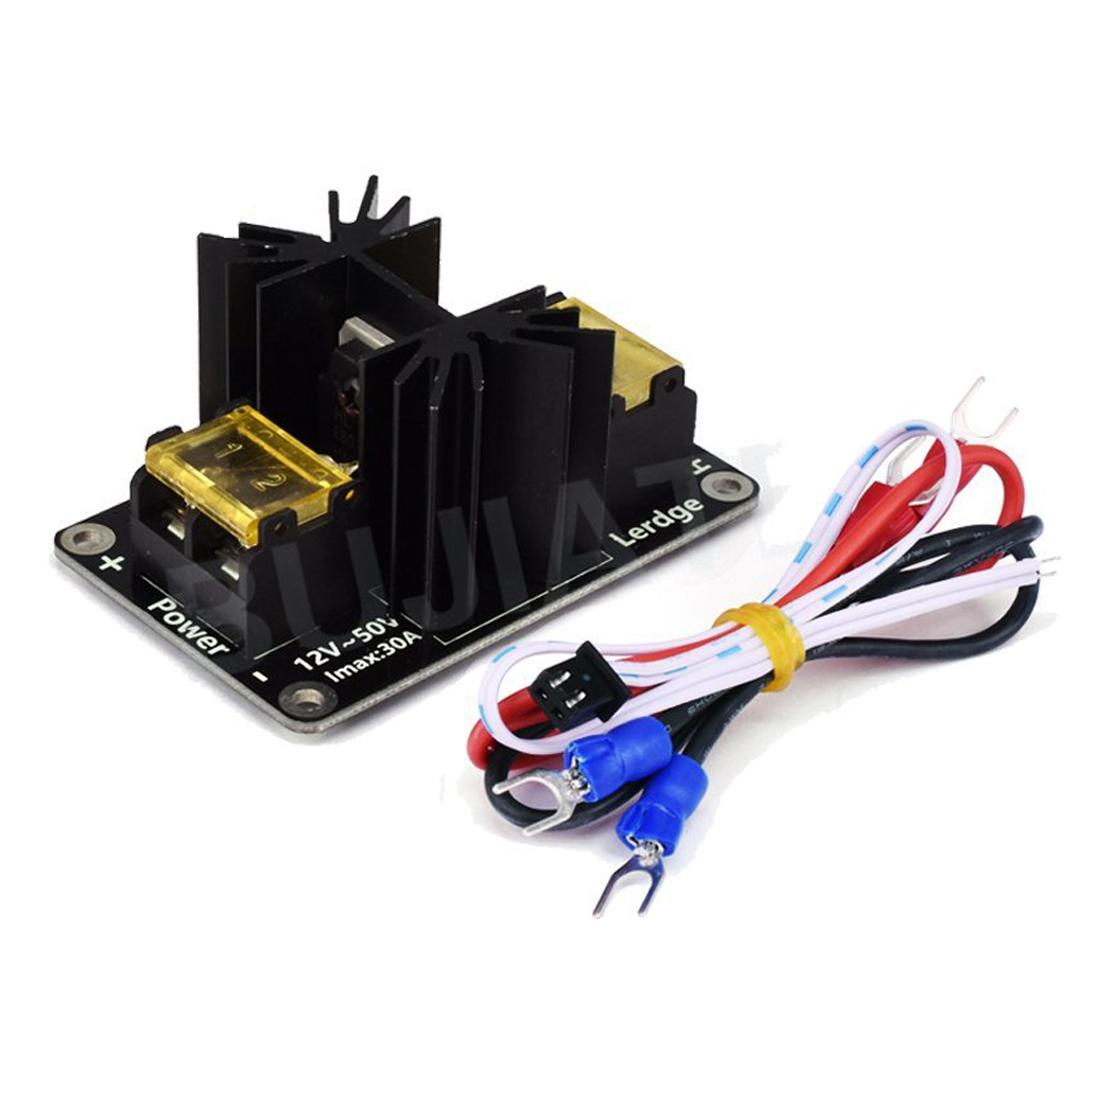 3D Printer Accessories 30A Mos Tube Heat Bed Power Module